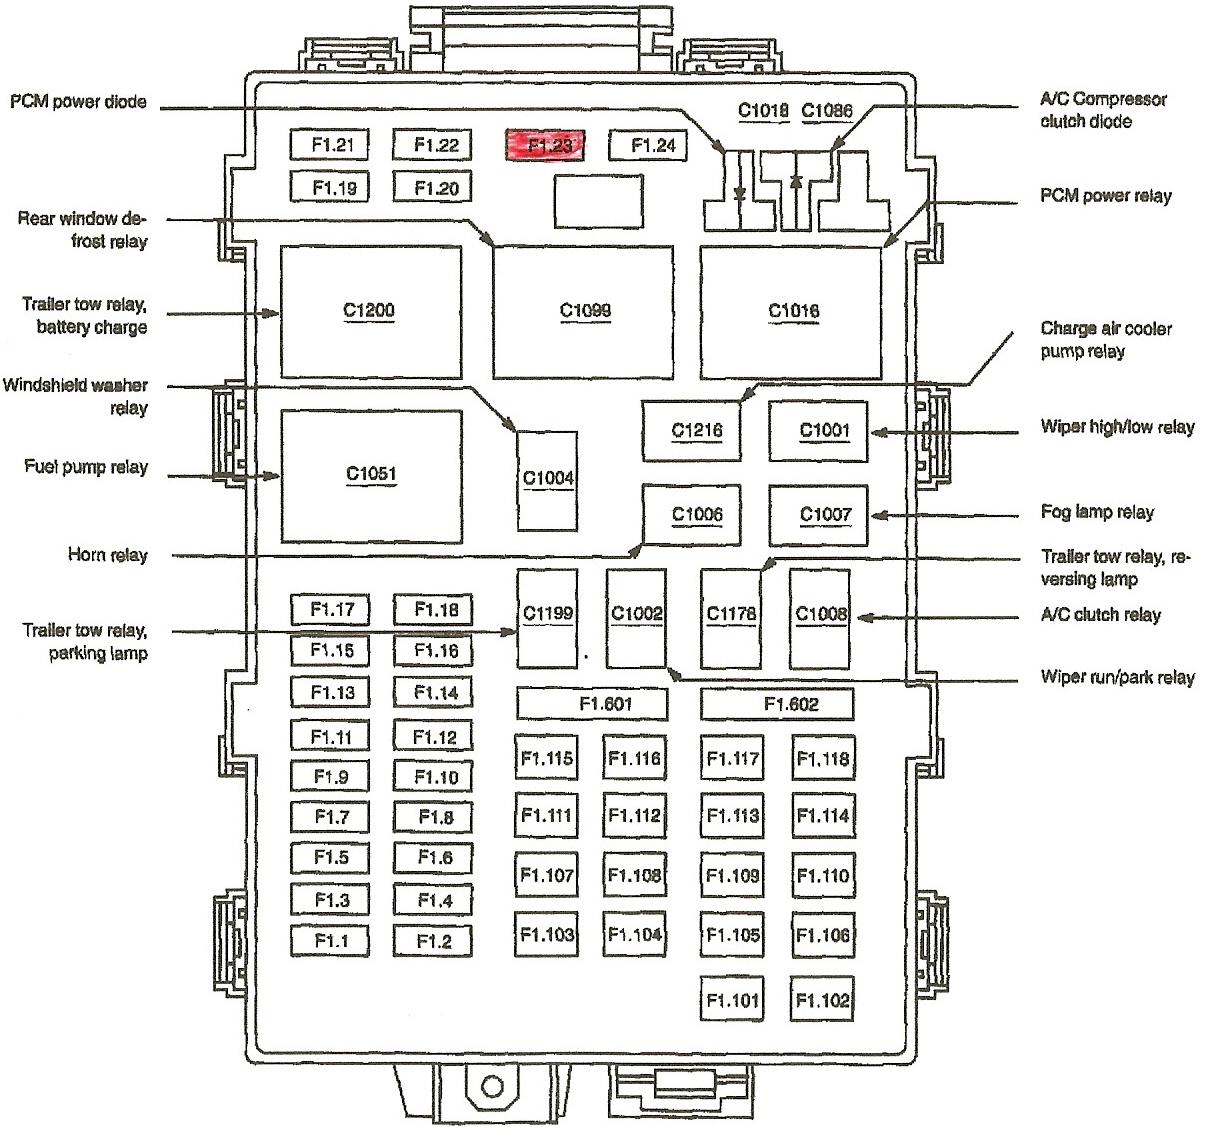 Diagram] 2008 Ford F150 4.2 Fuse Box Diagram Full Version Hd